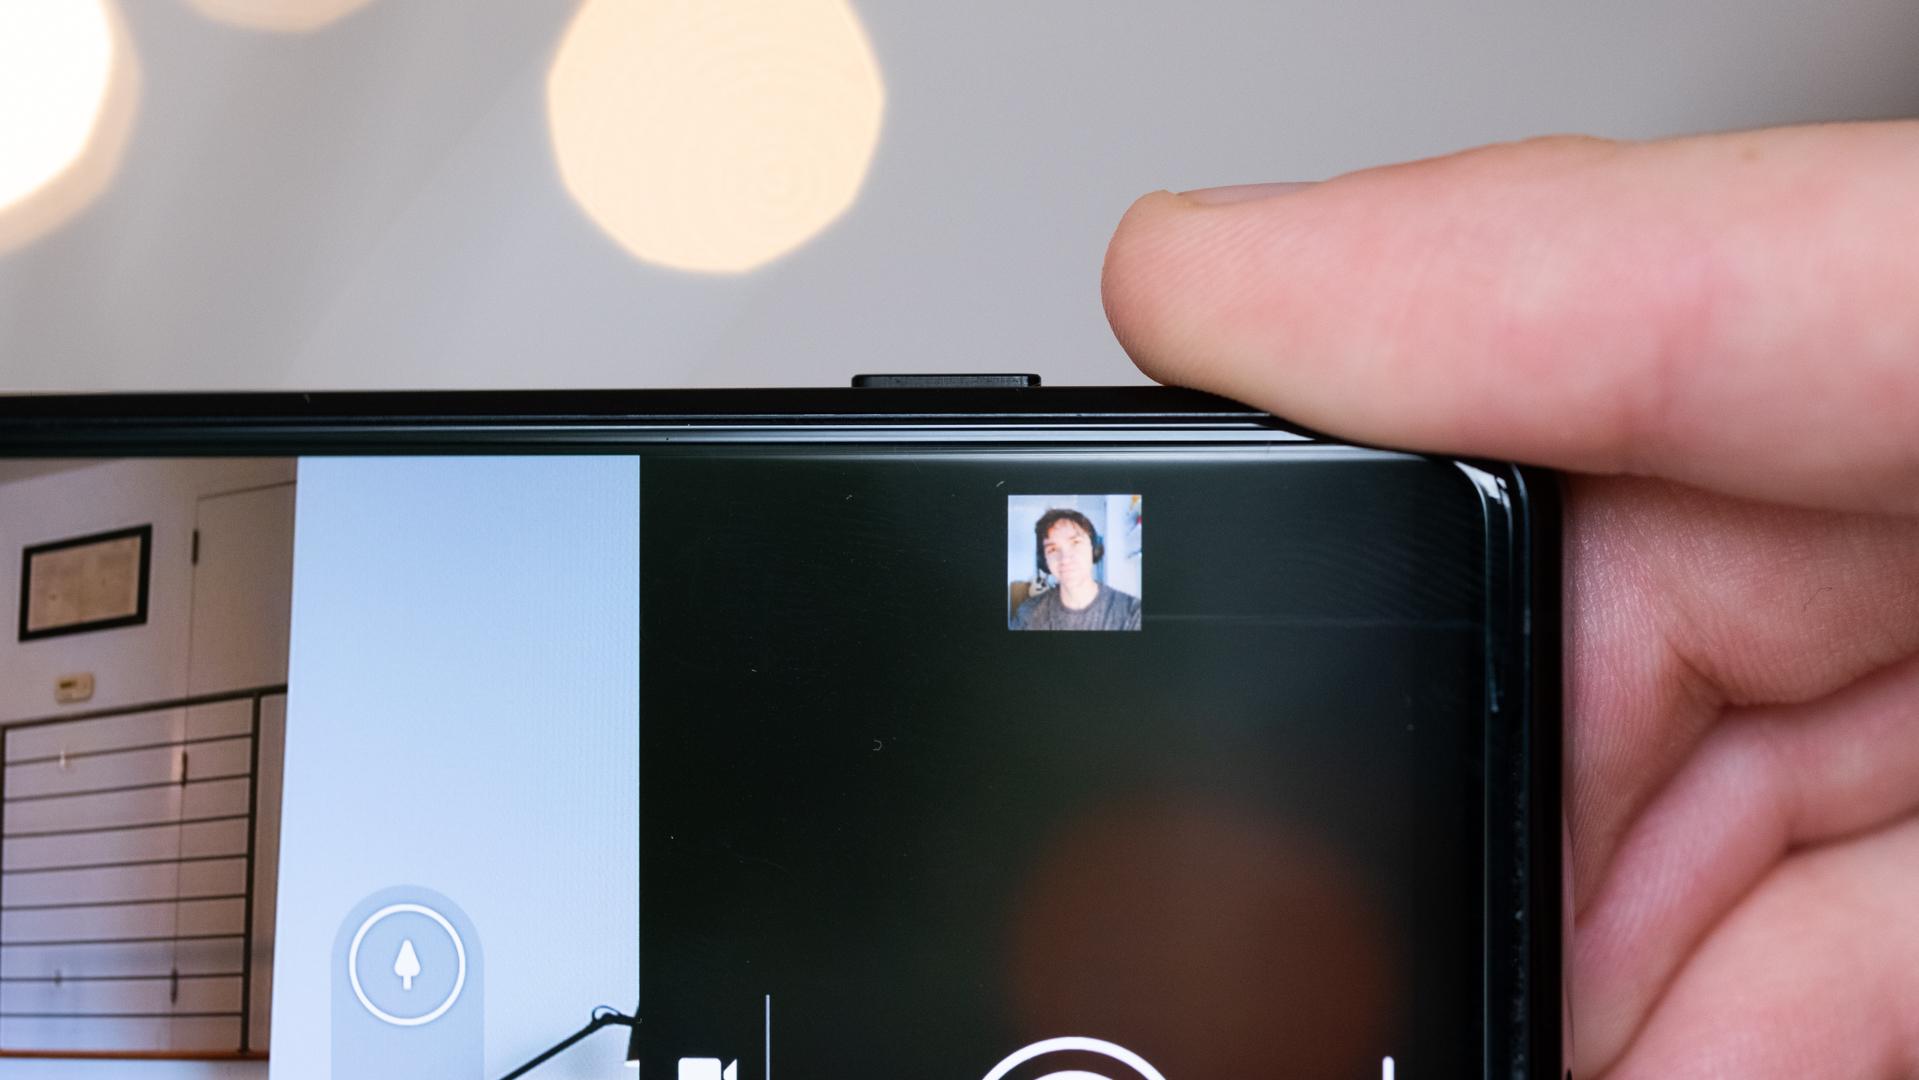 Sony Xperia 1 II dedicated camera shutter